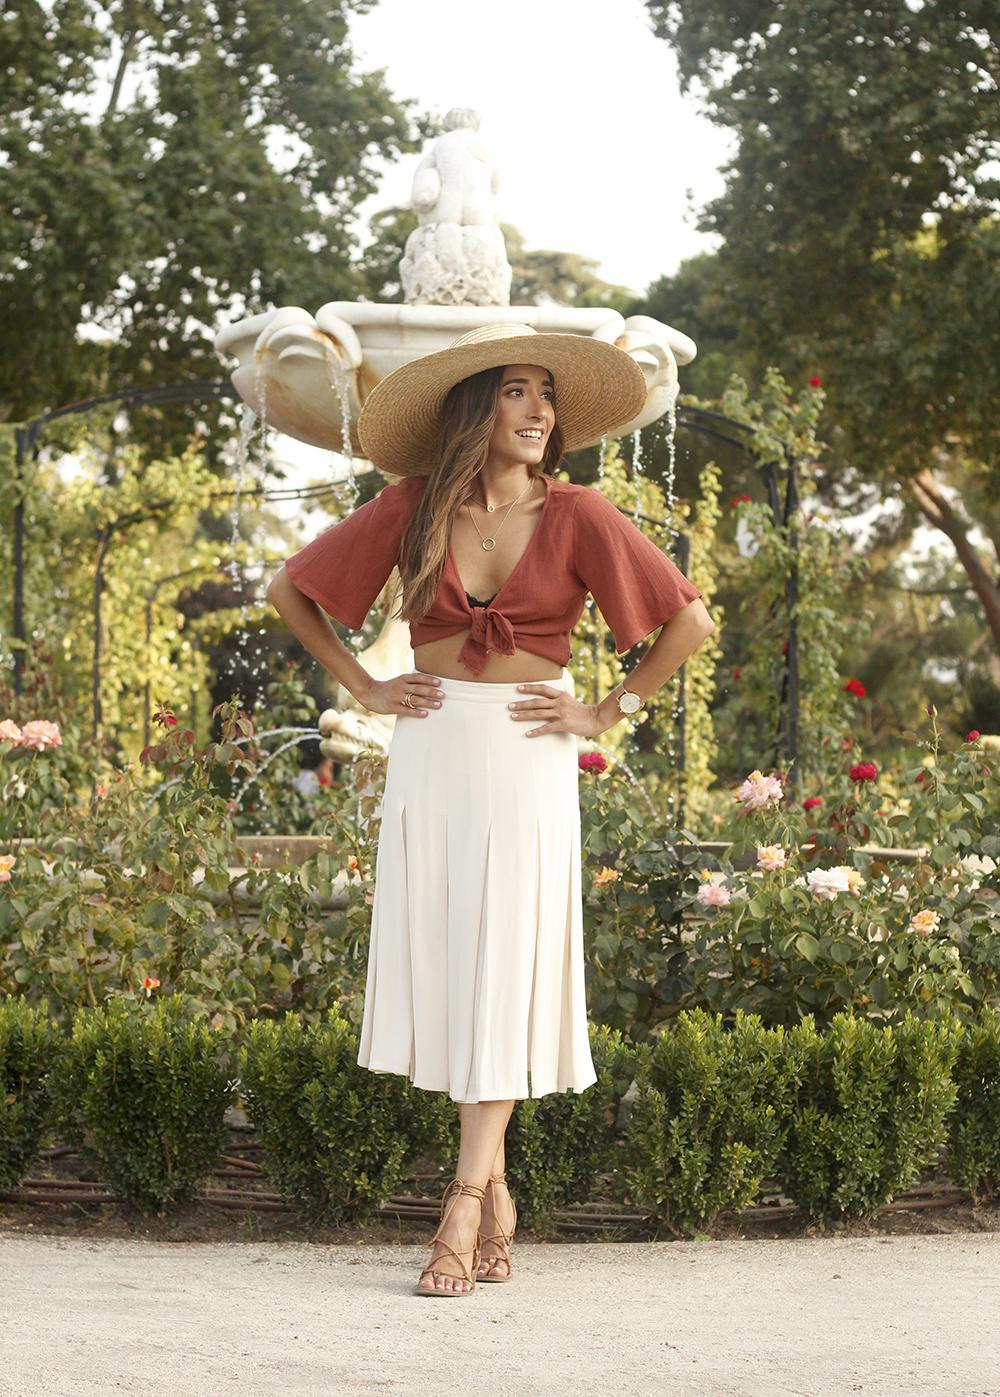 terracotta top white midi skirt straw hat flat sandals street style 201803